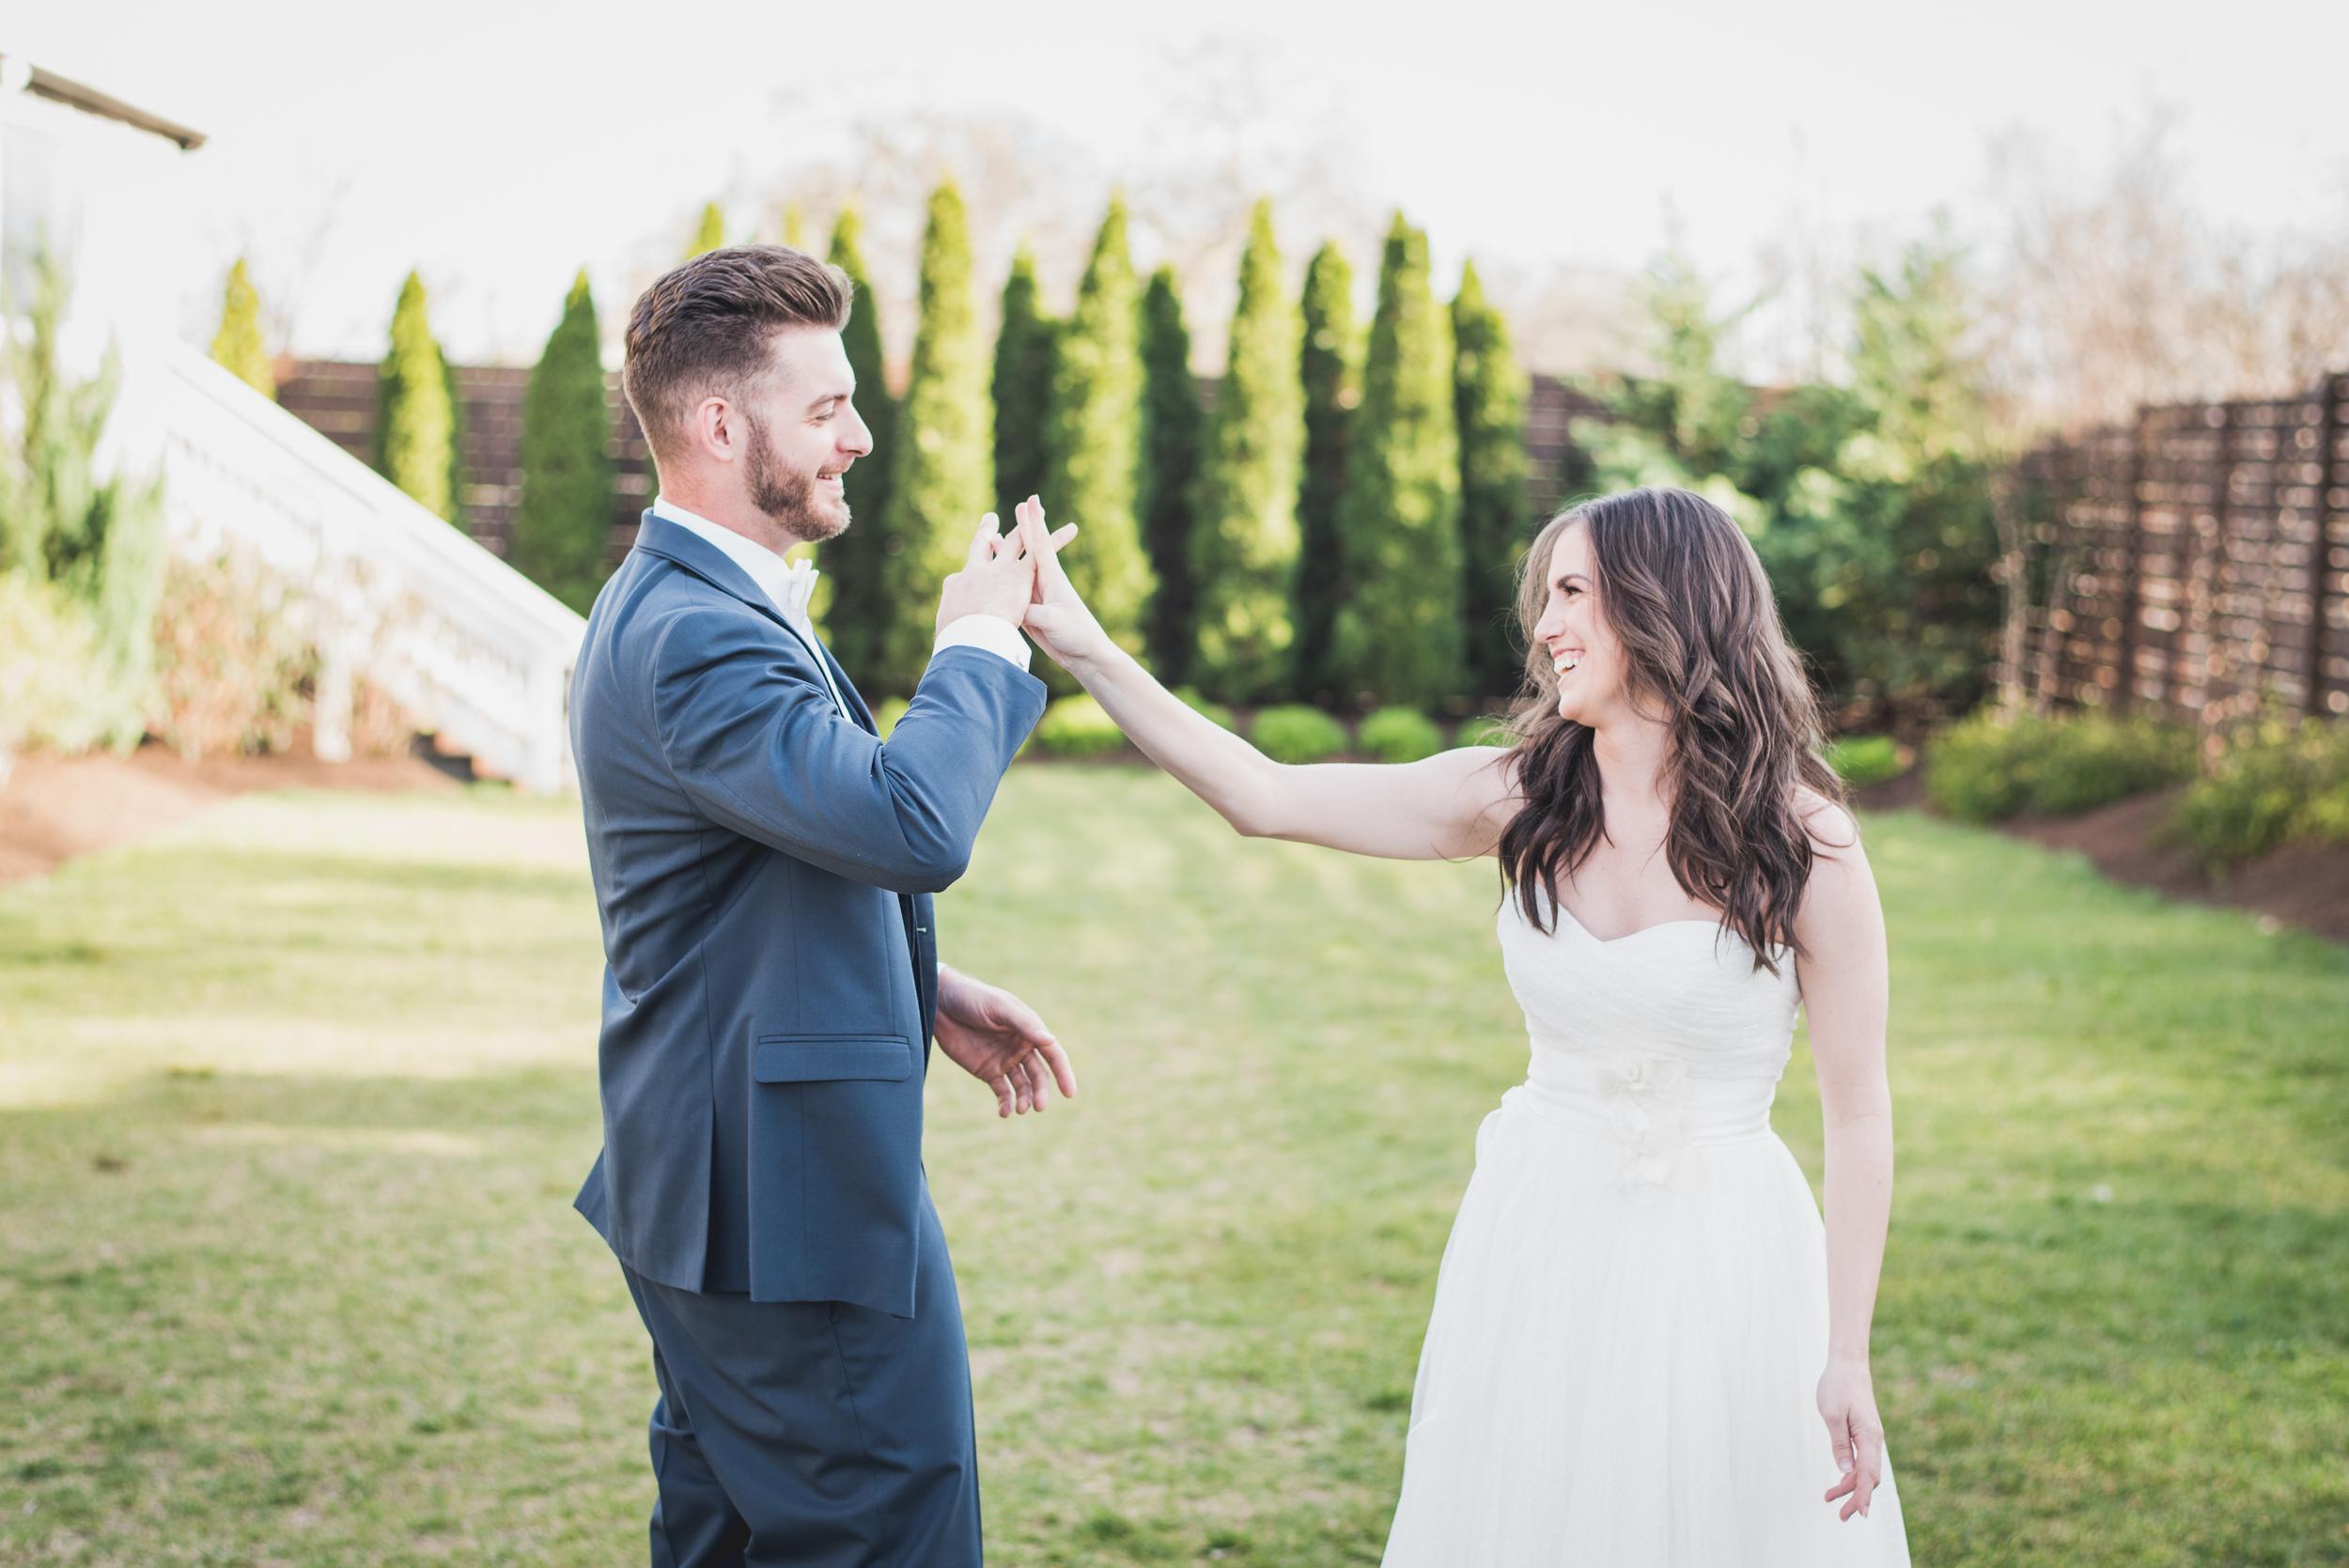 The-Cordelle-Nashville-TN-Wedding-Photography-38.jpg